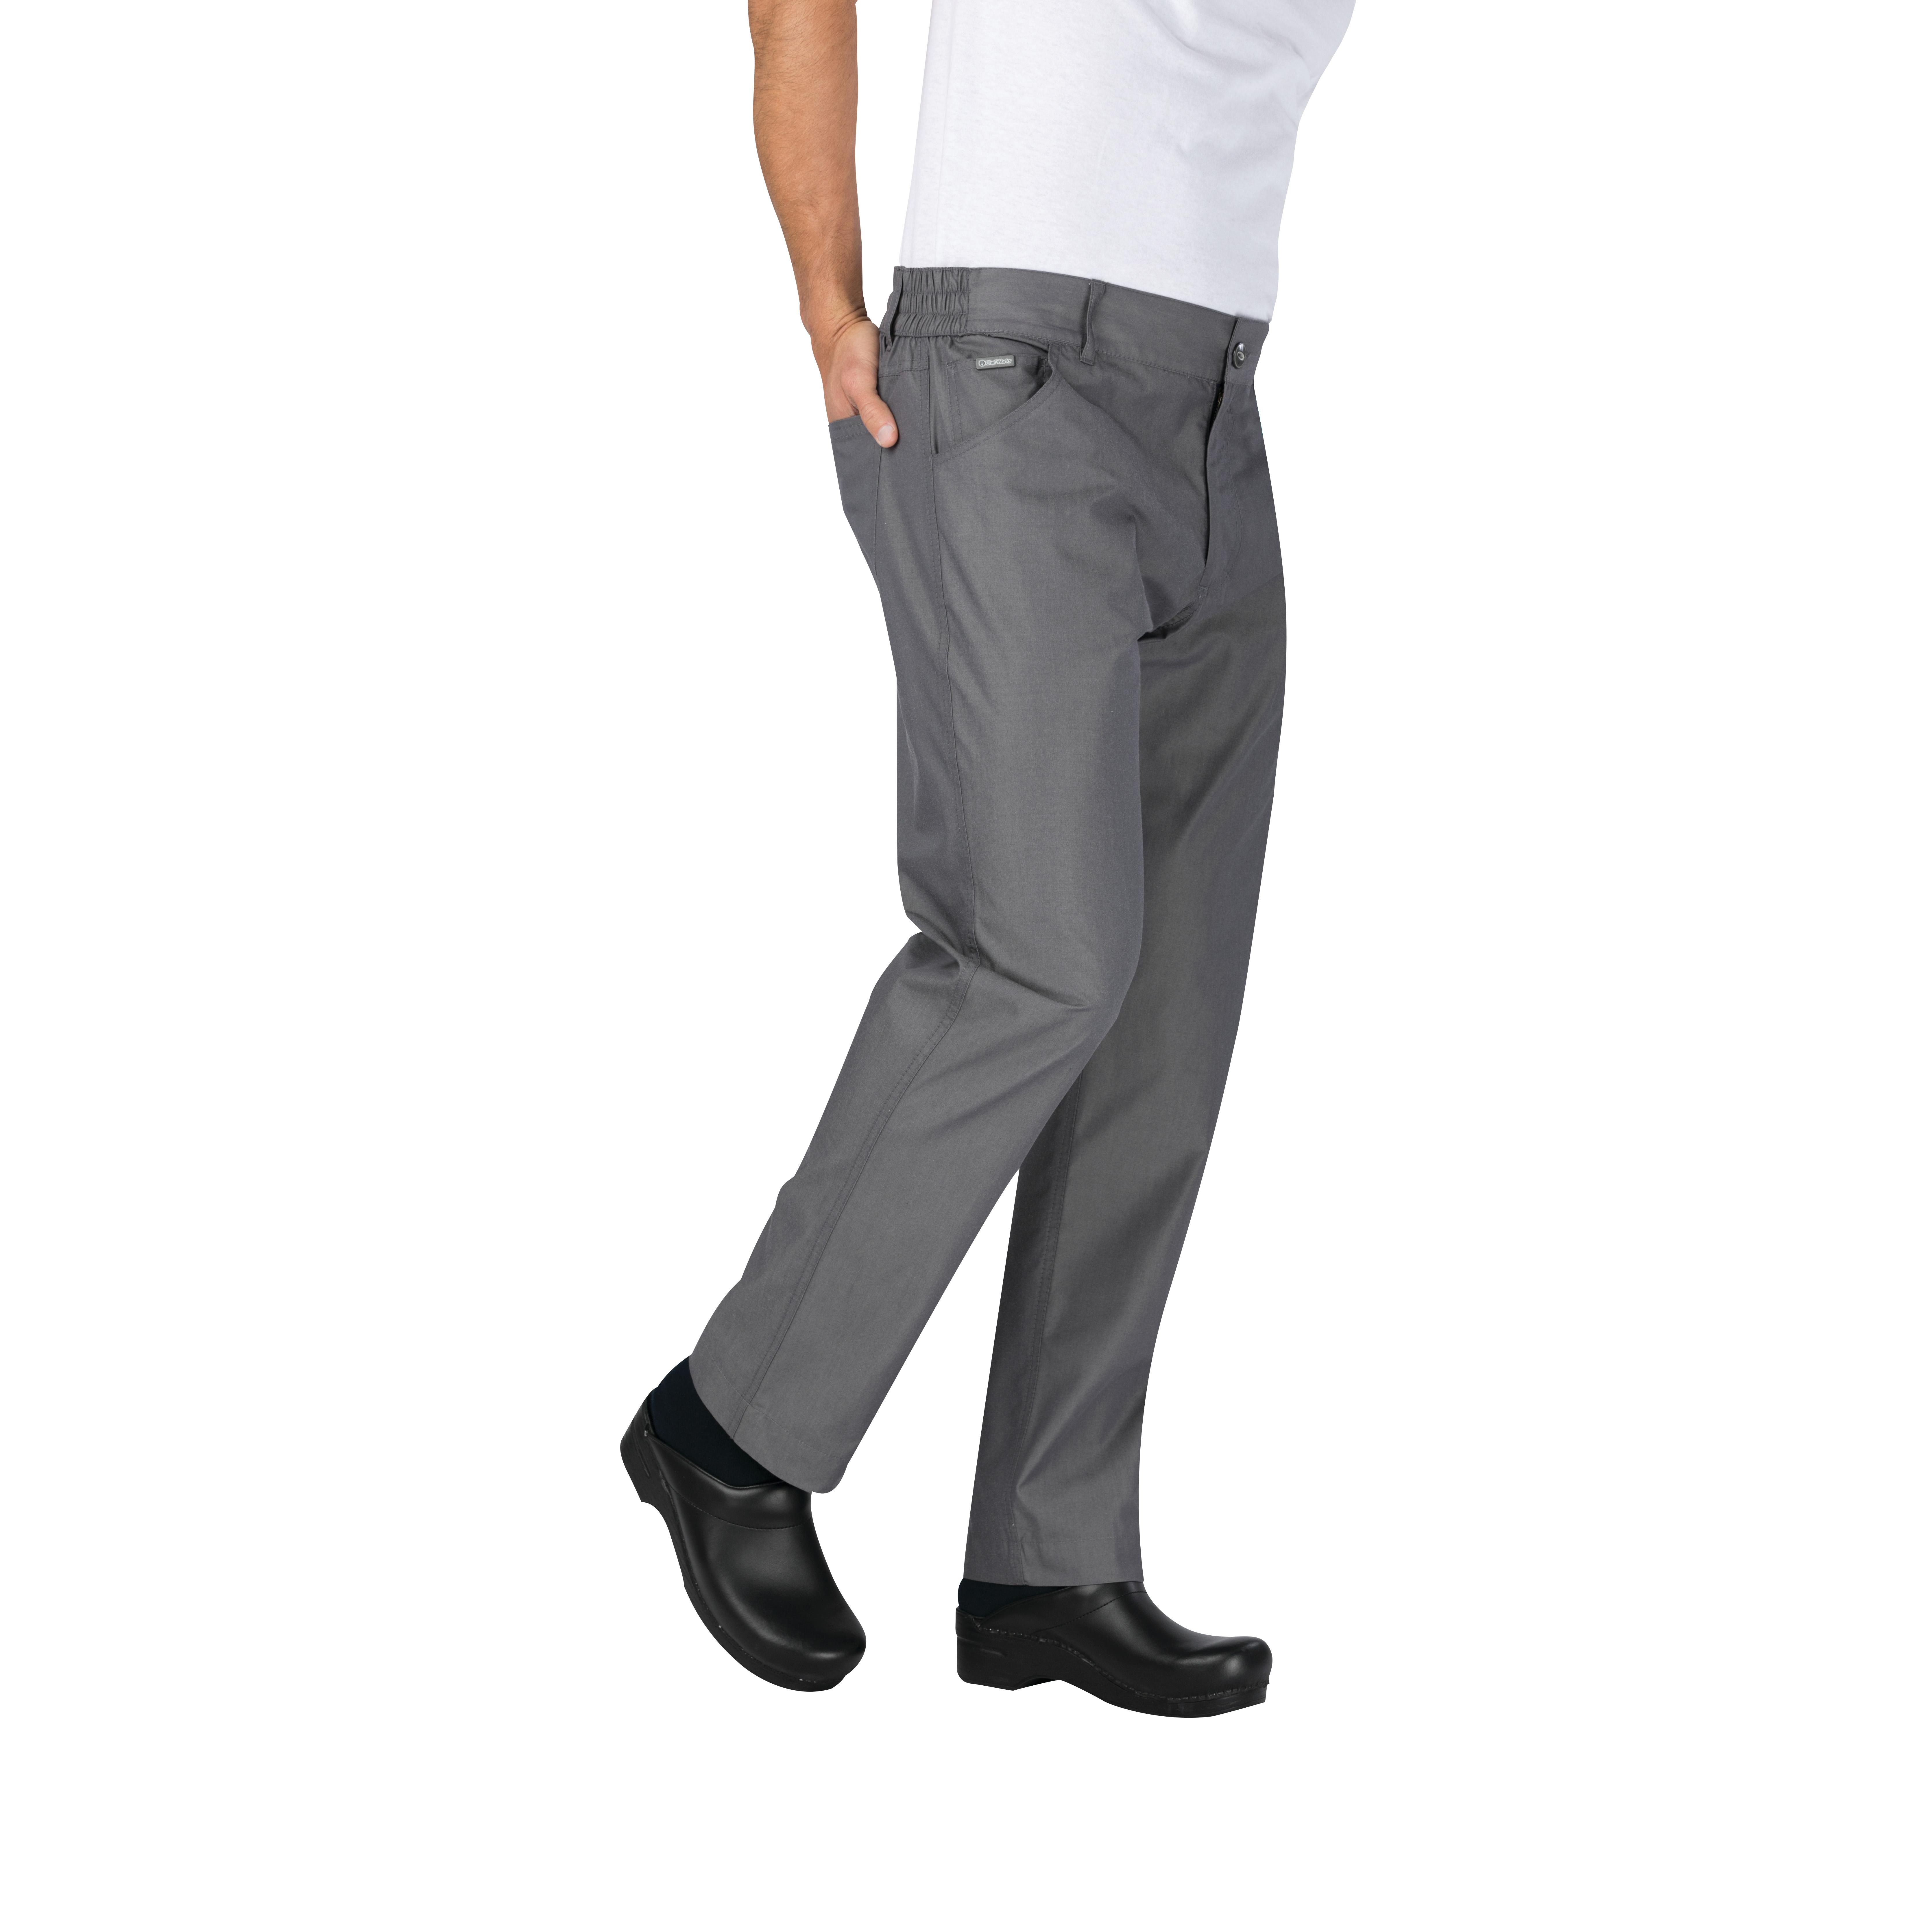 Chef Works PEN02SBL2XL chef's pants